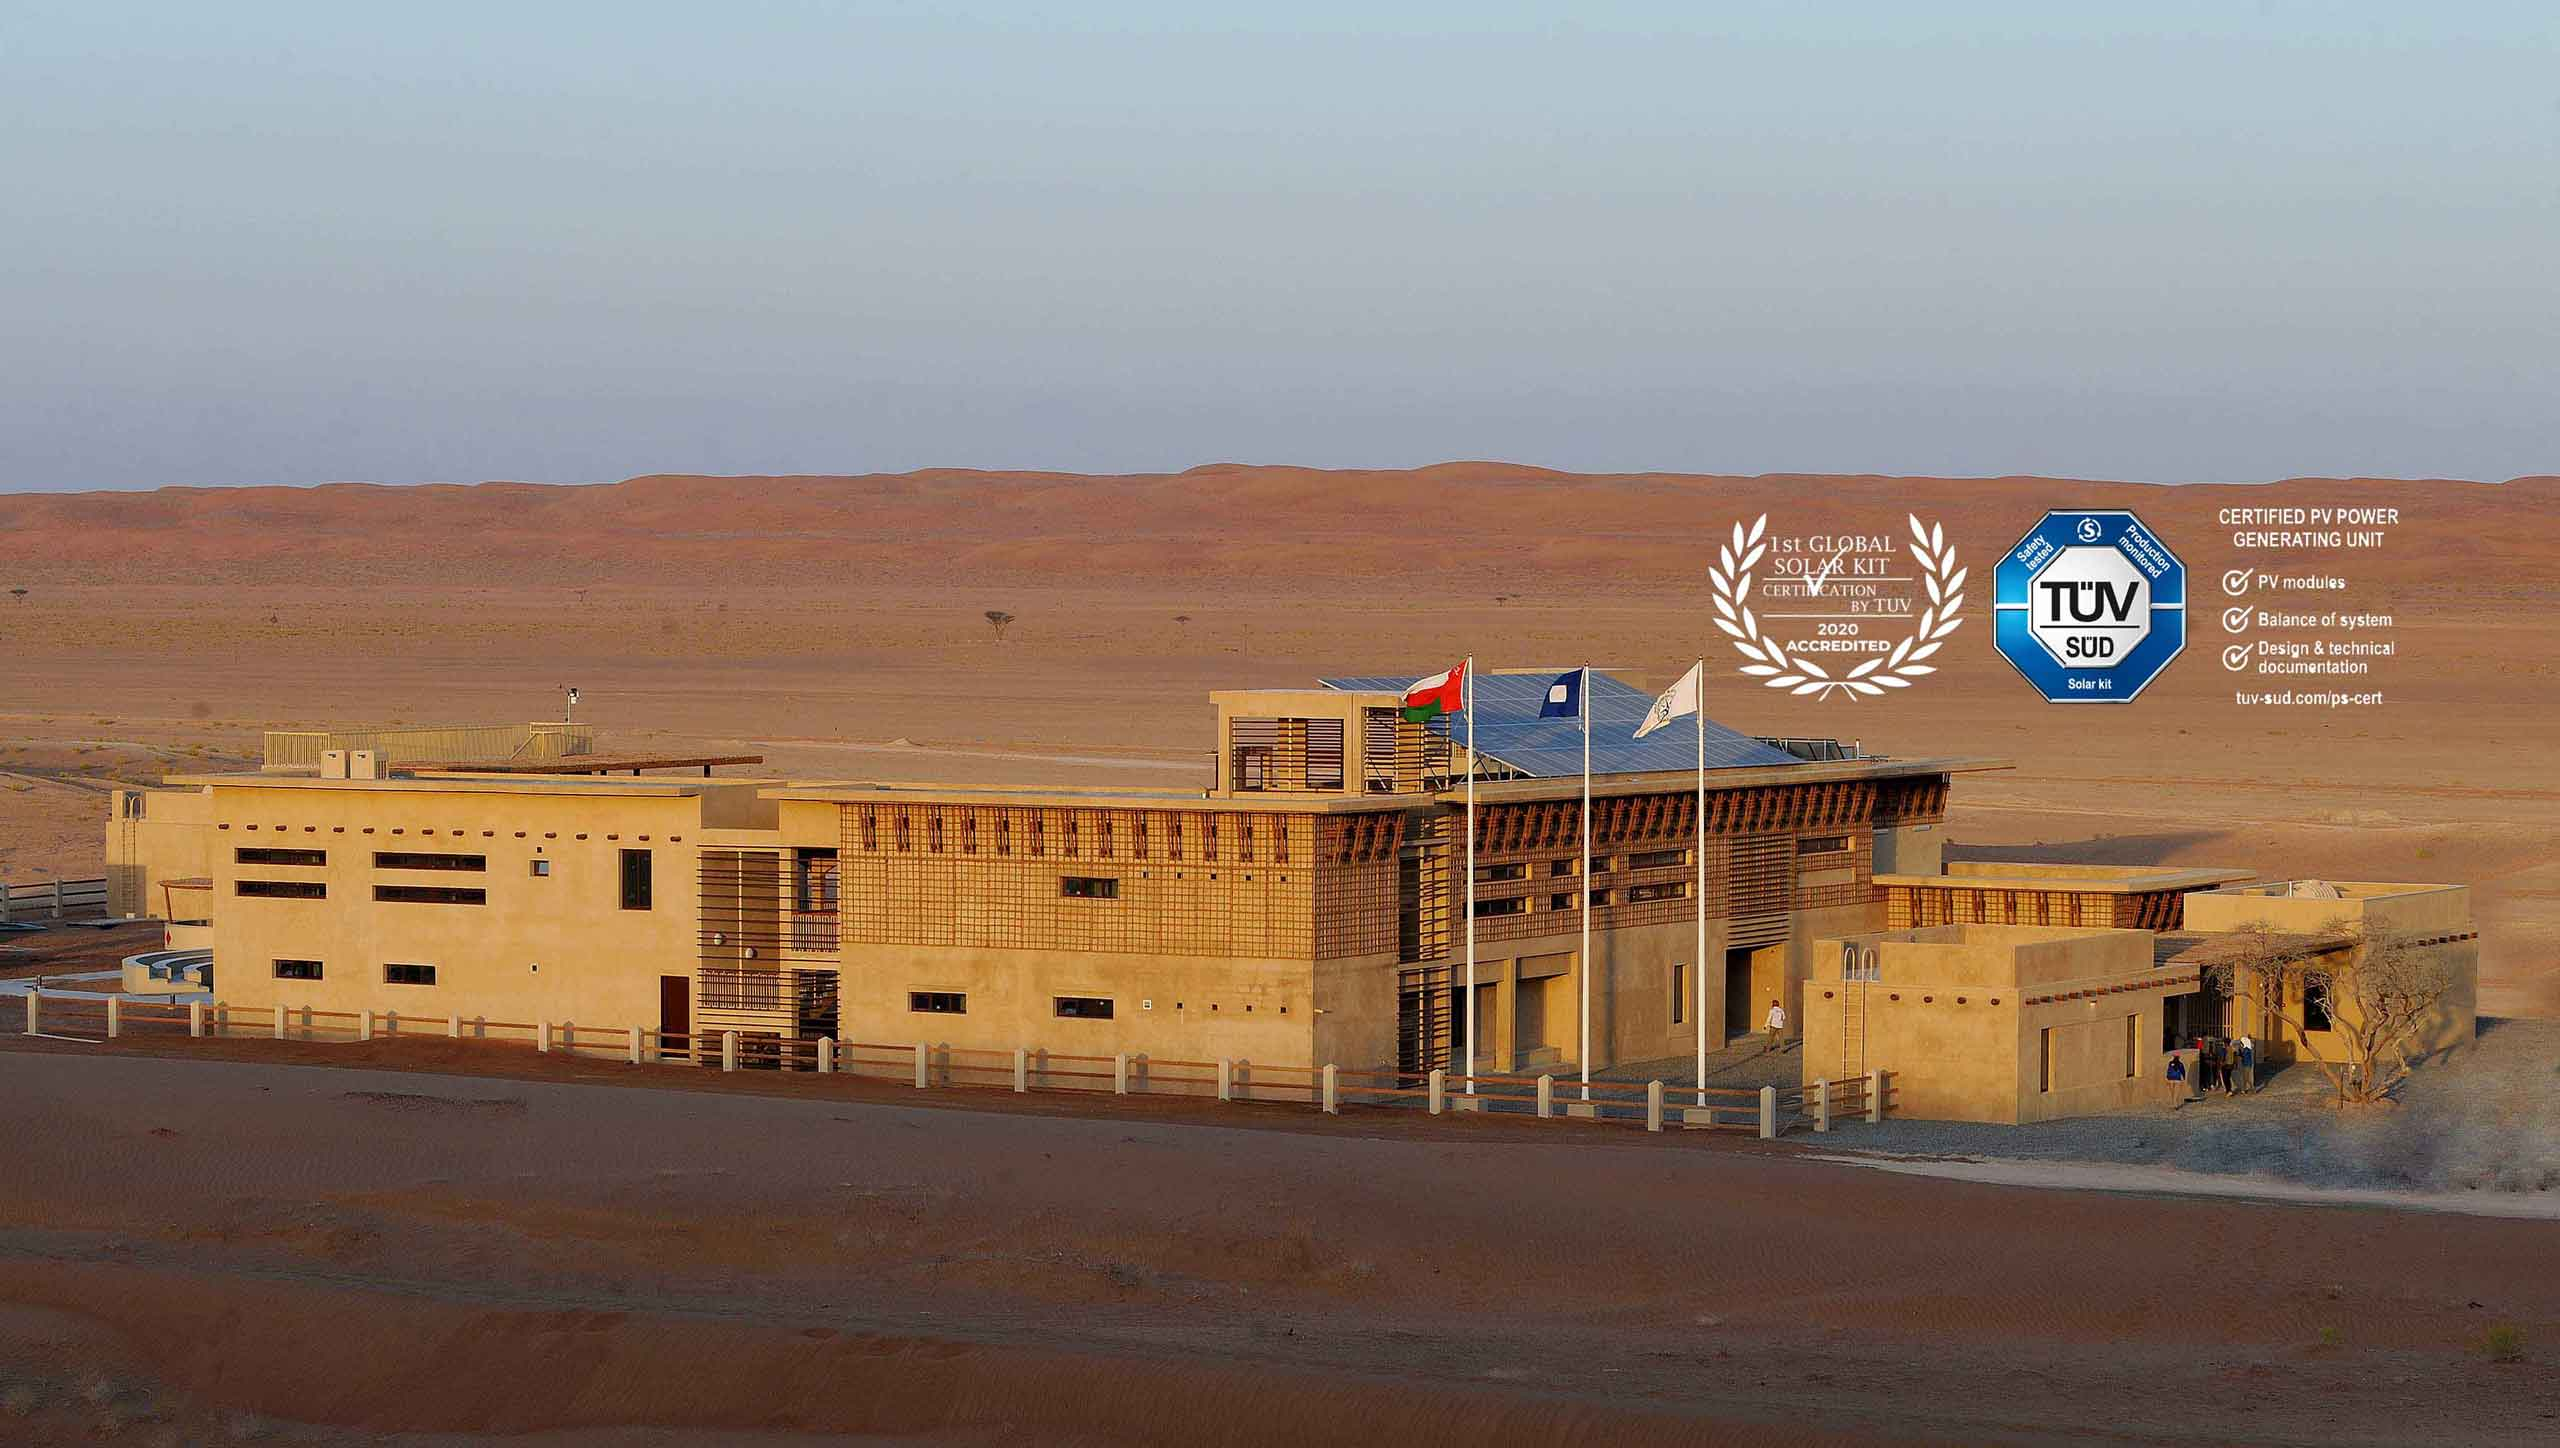 Outward-Bound-Oman-PV-Array-Install-Photo-for-Website.2jpg